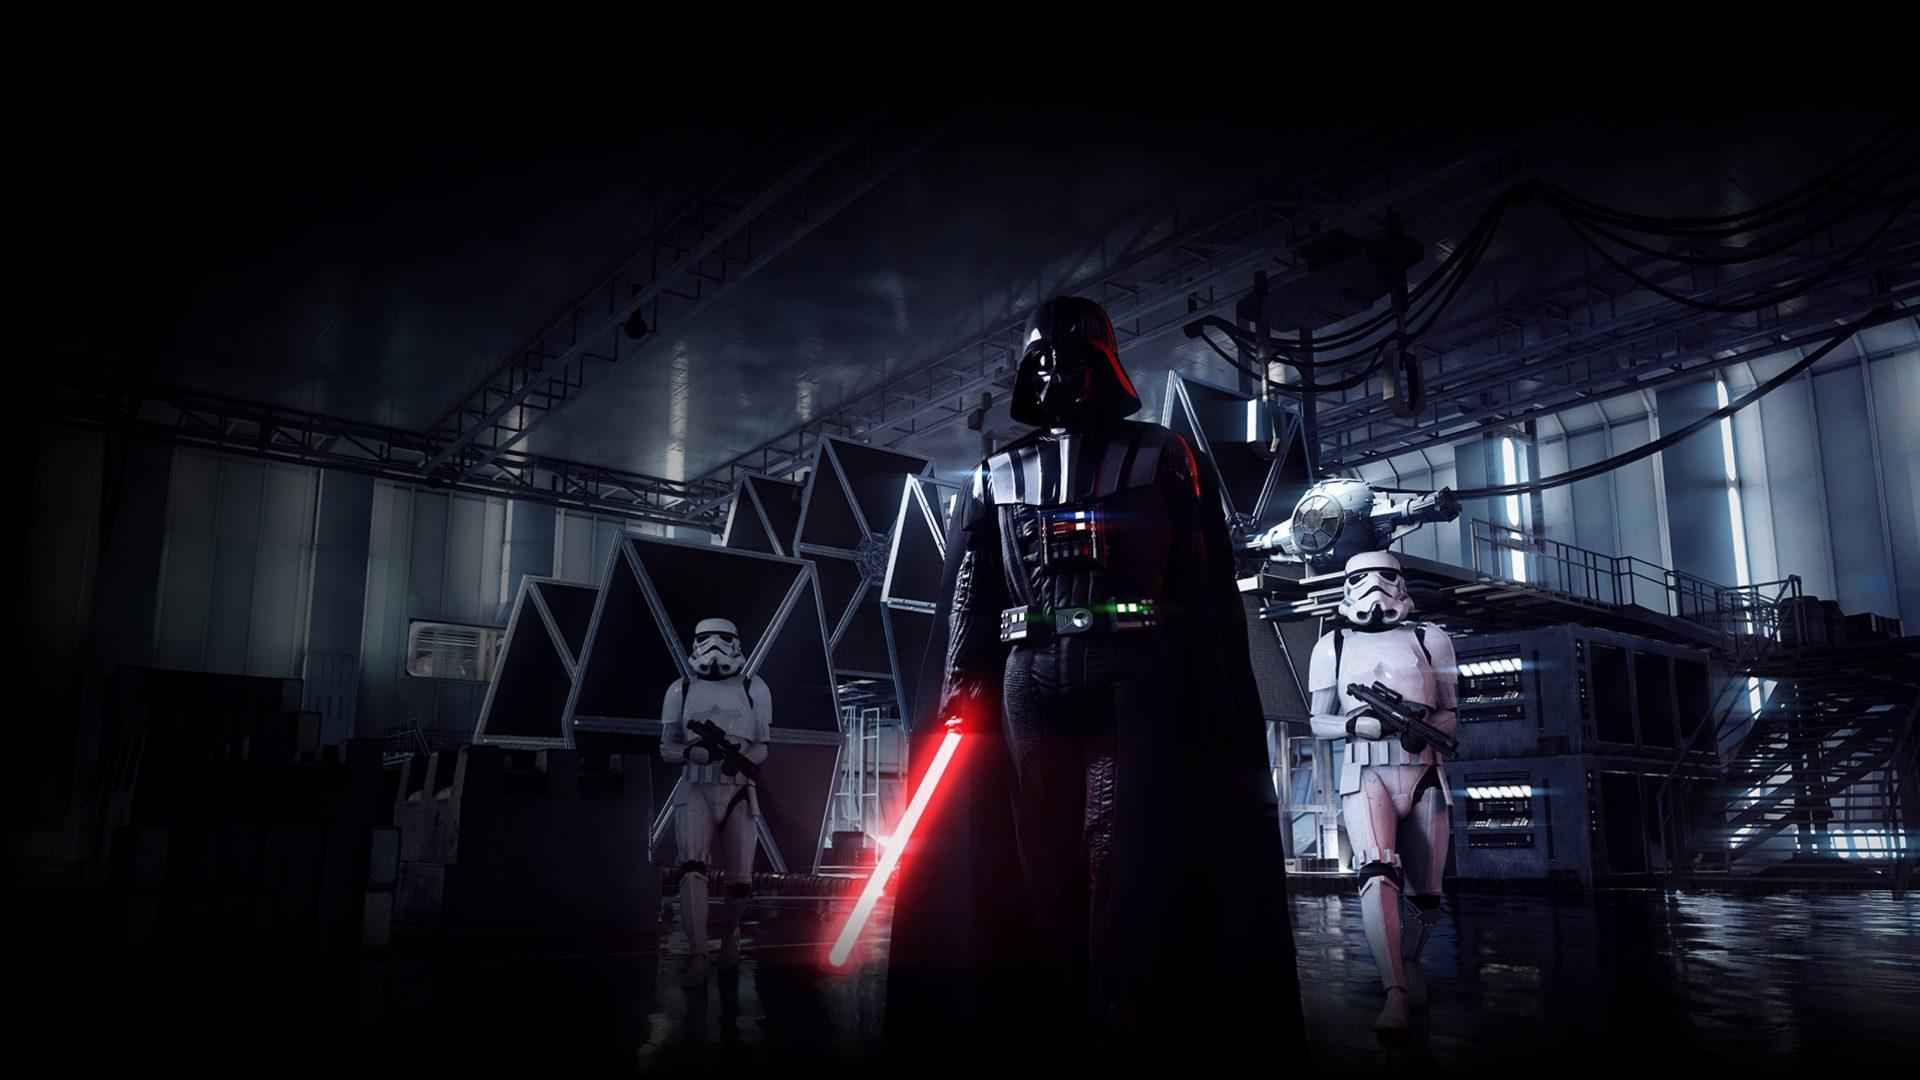 Star Wars Battlefront II (2017) HD Wallpaper